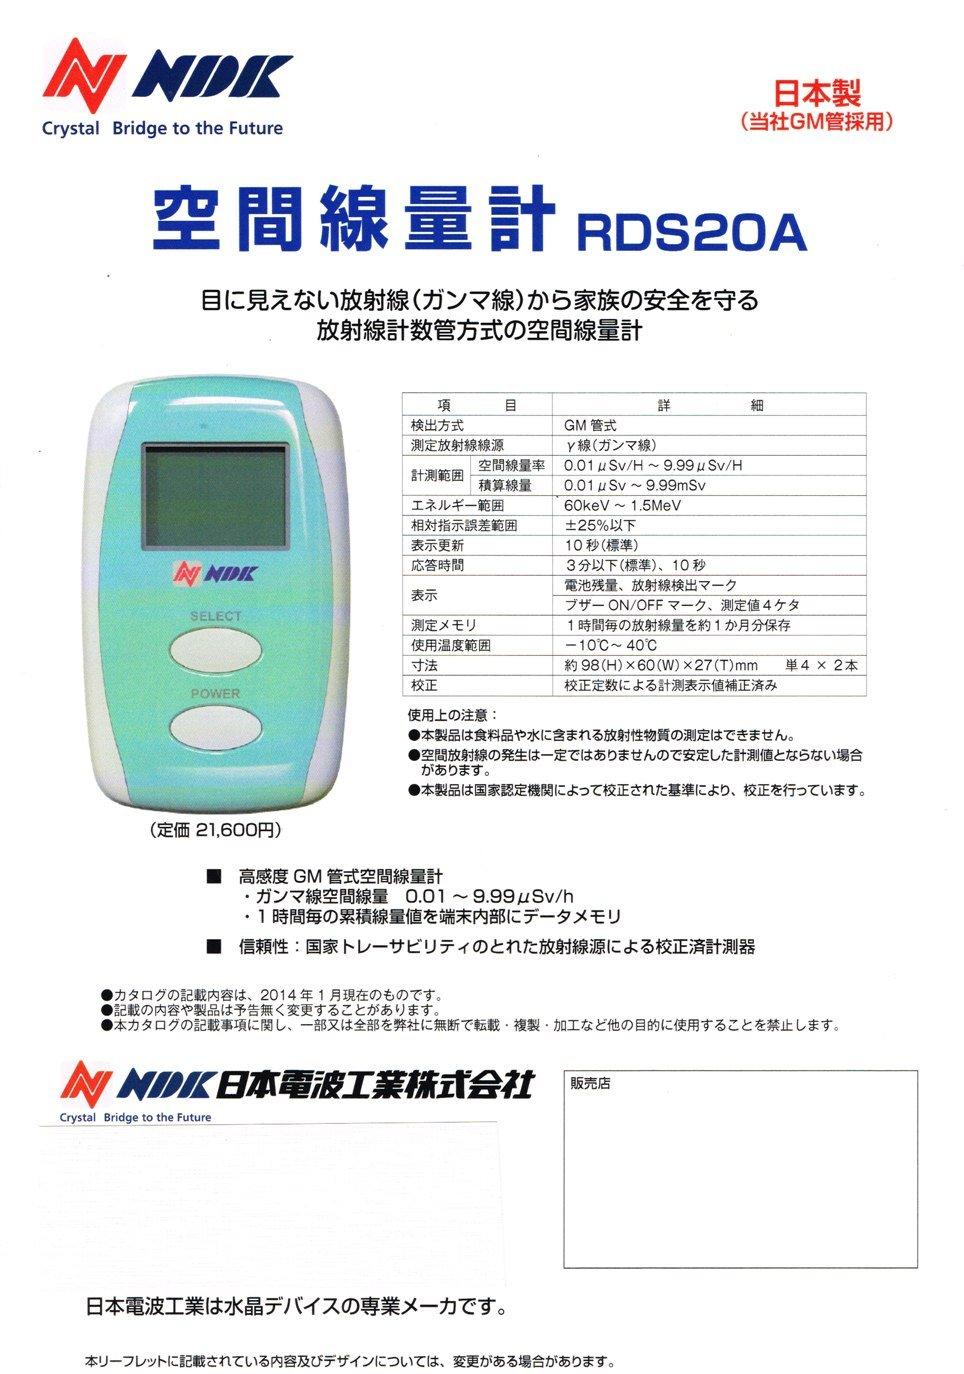 ガイガーカウンター 放射線測定器 放射能空間線量計 携帯用放射能測定器 B00LSCMRKK